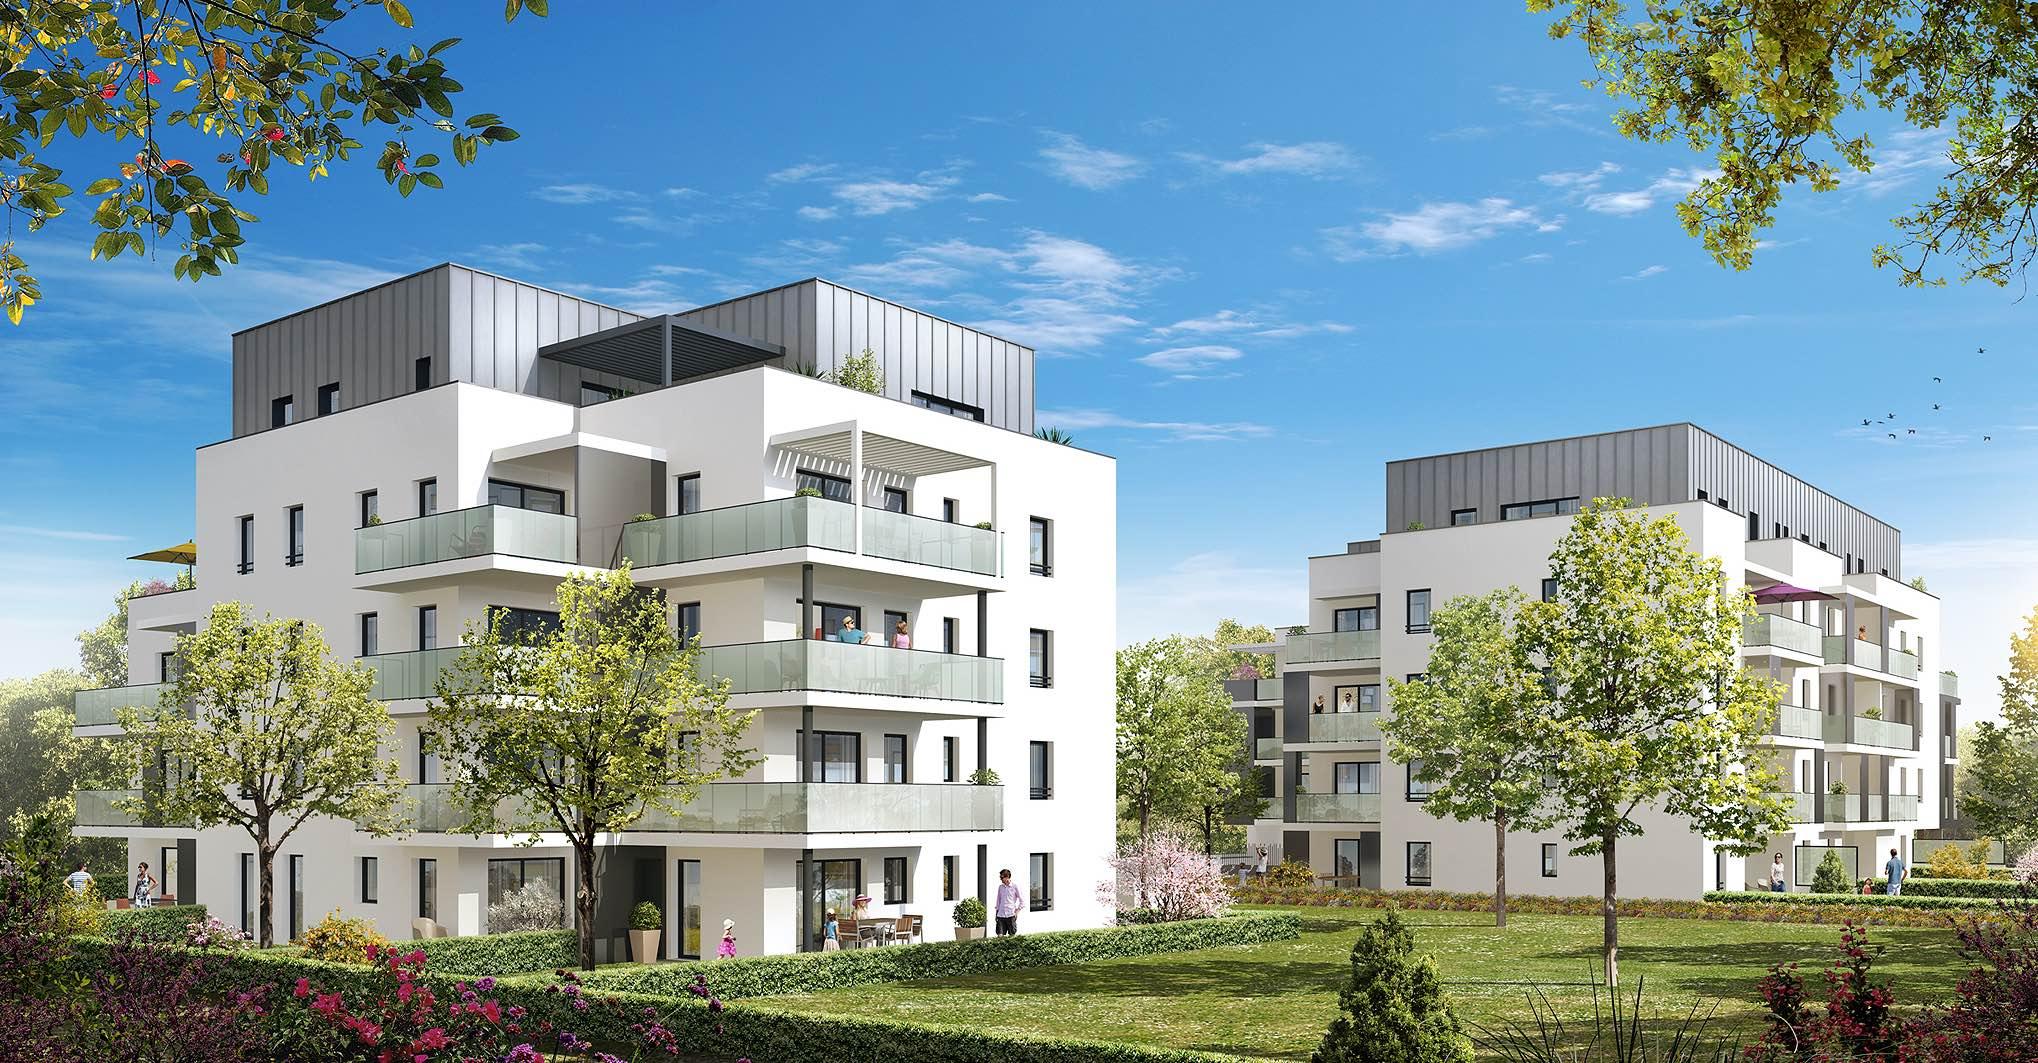 Programme immobilier St Julien En Genevois (74160) Quartier vert et fleuri VAL69